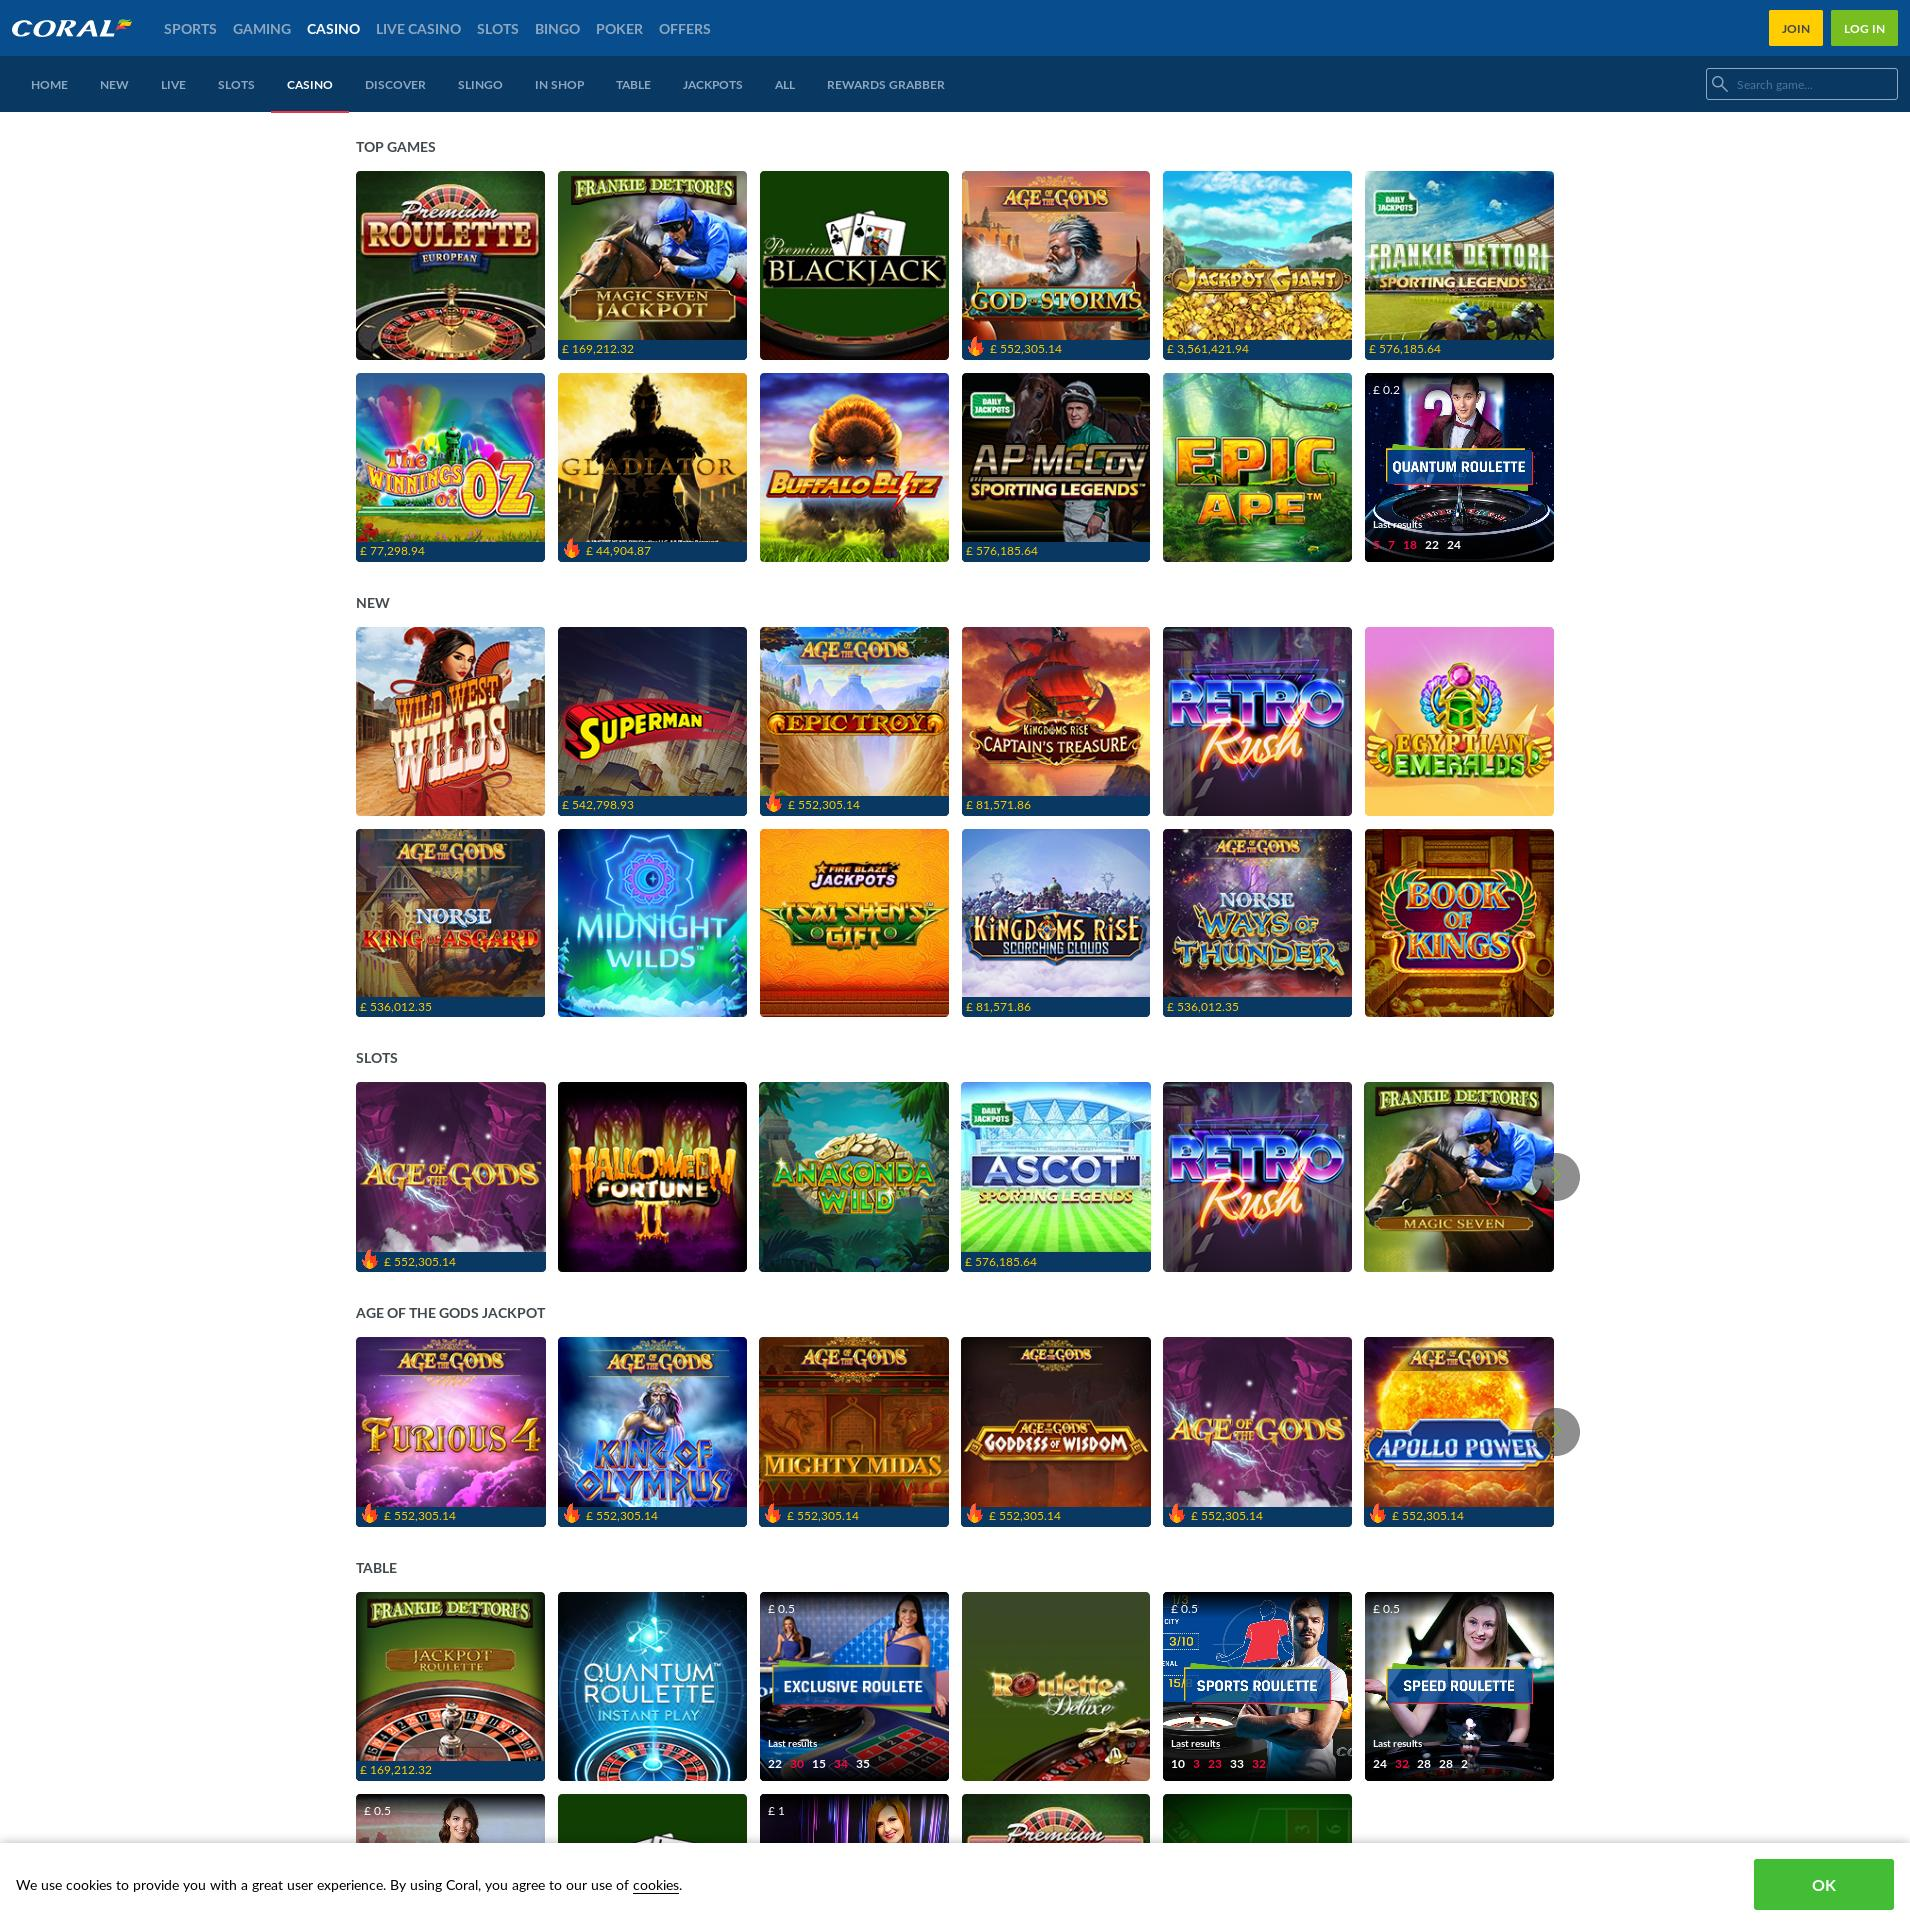 Casino screen Lobby 2020-05-25 for United Kingdom